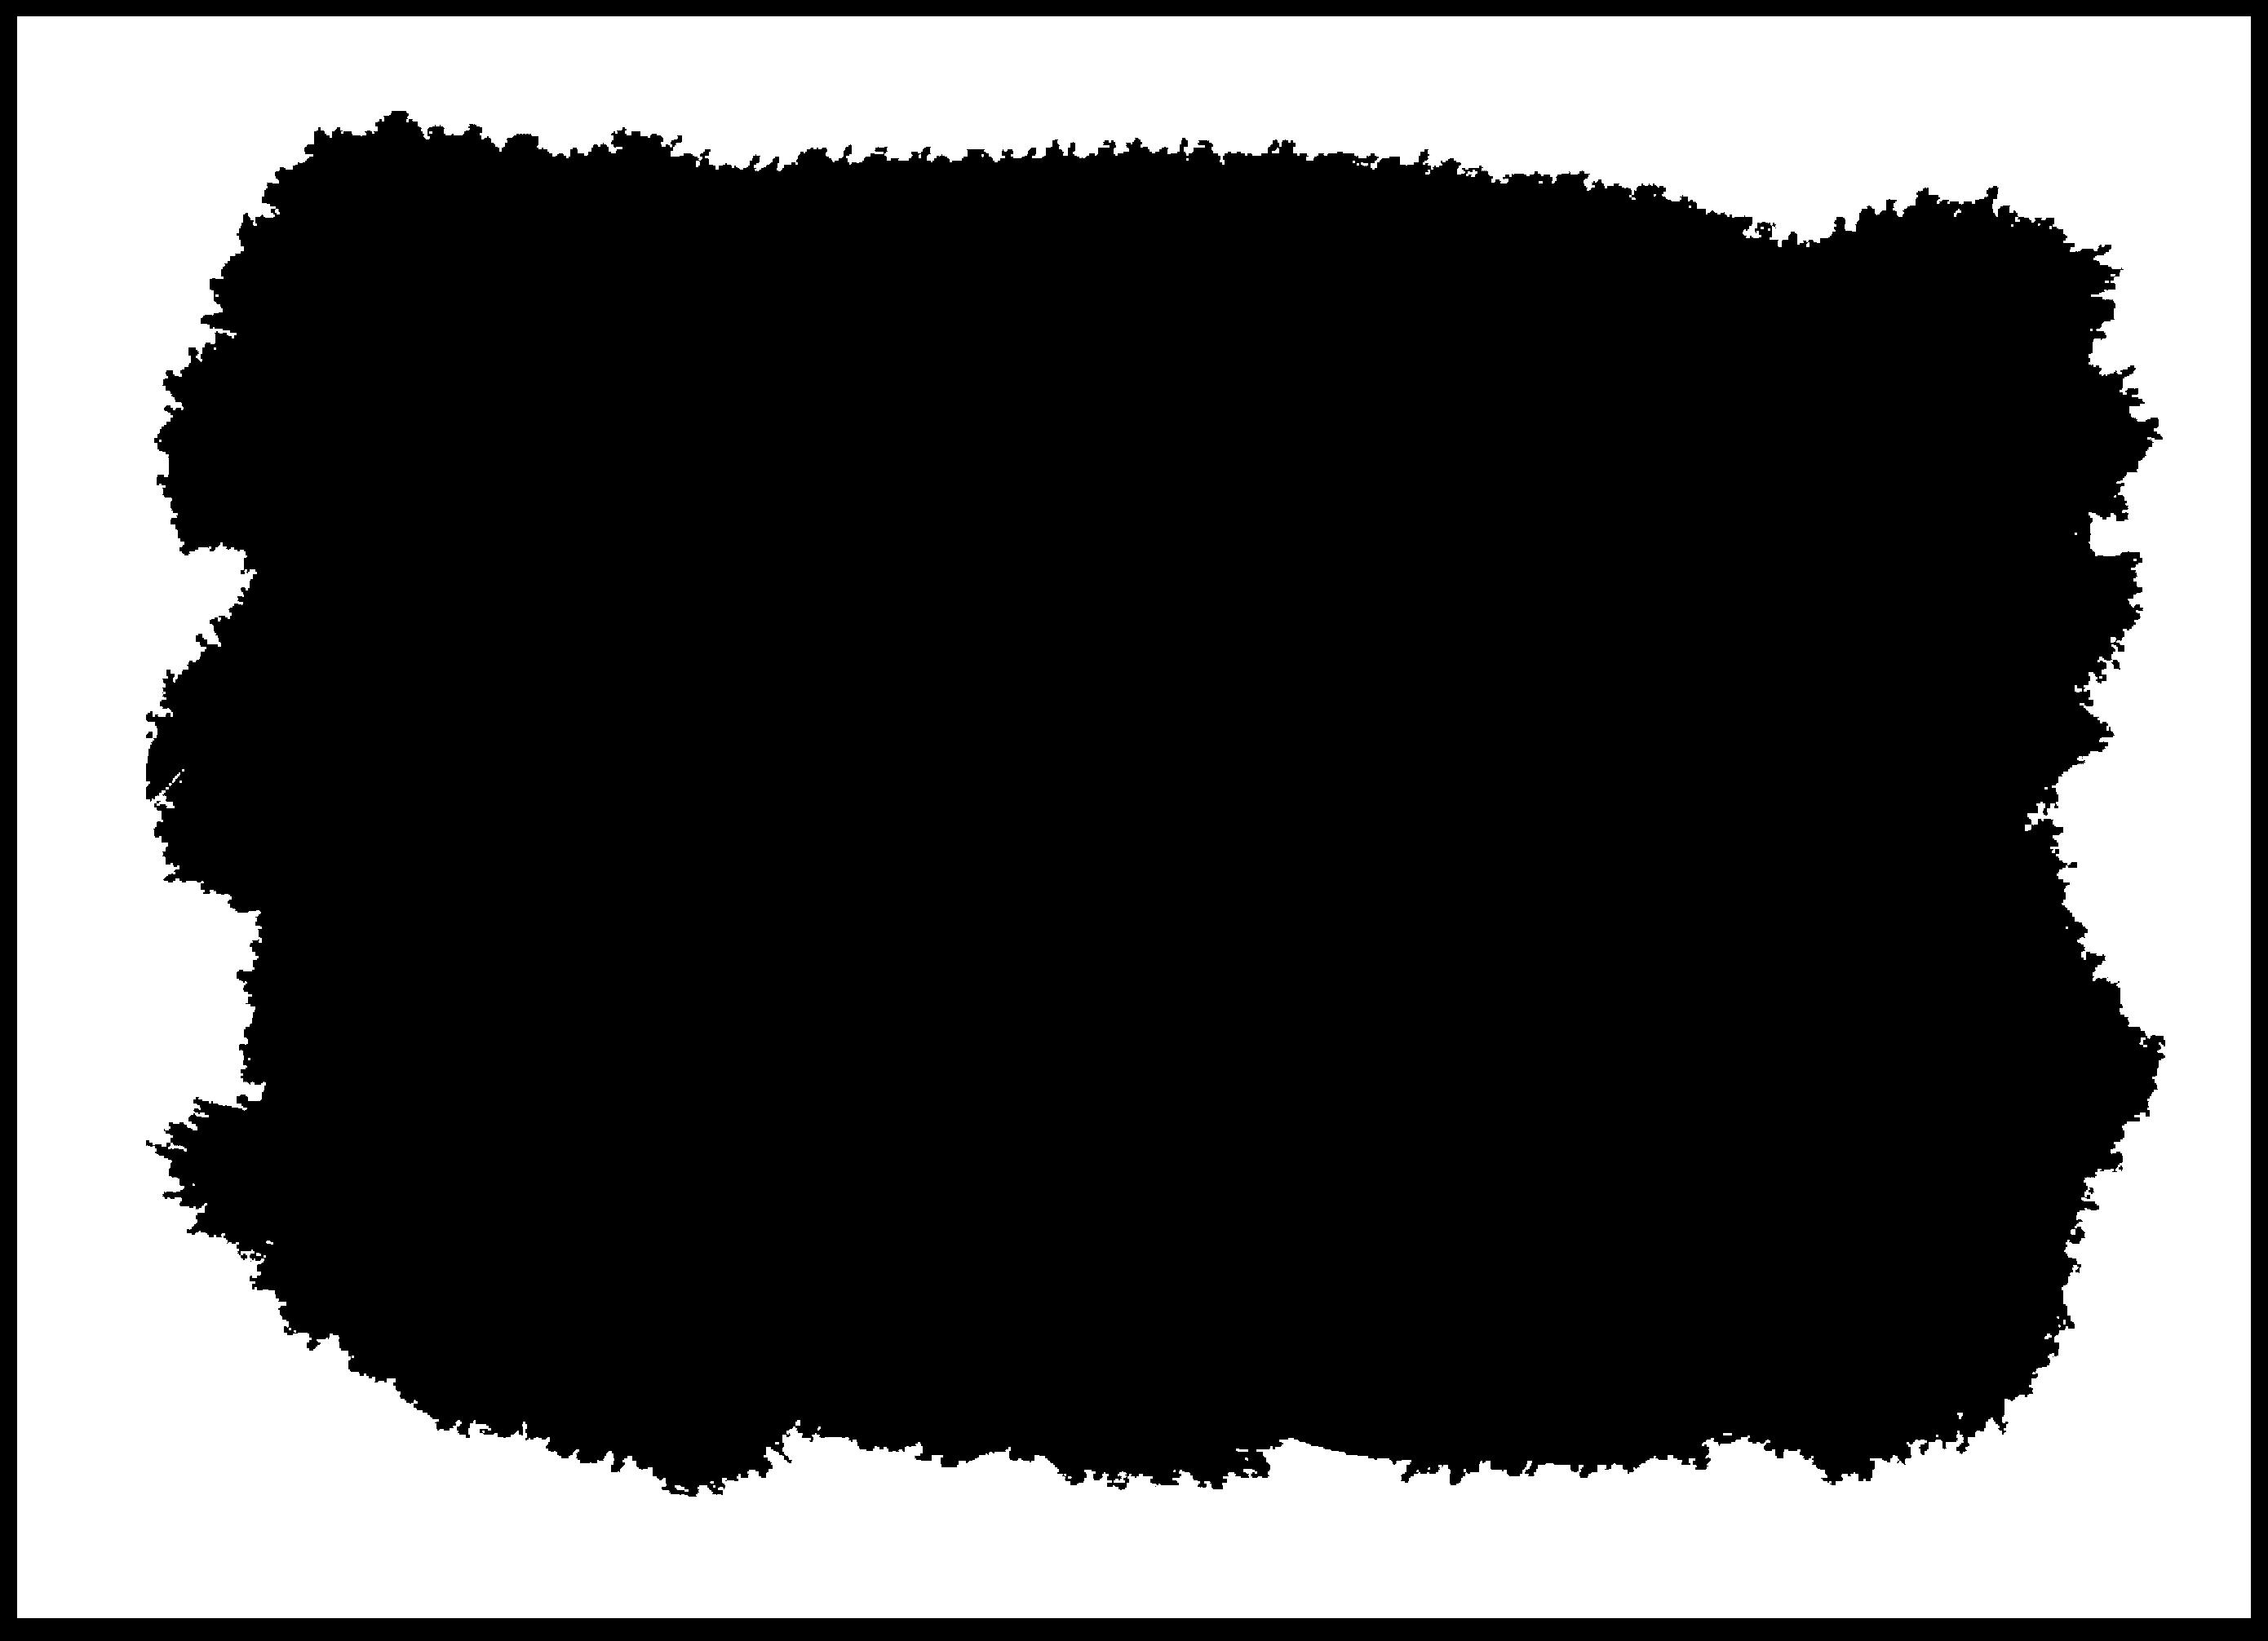 file name